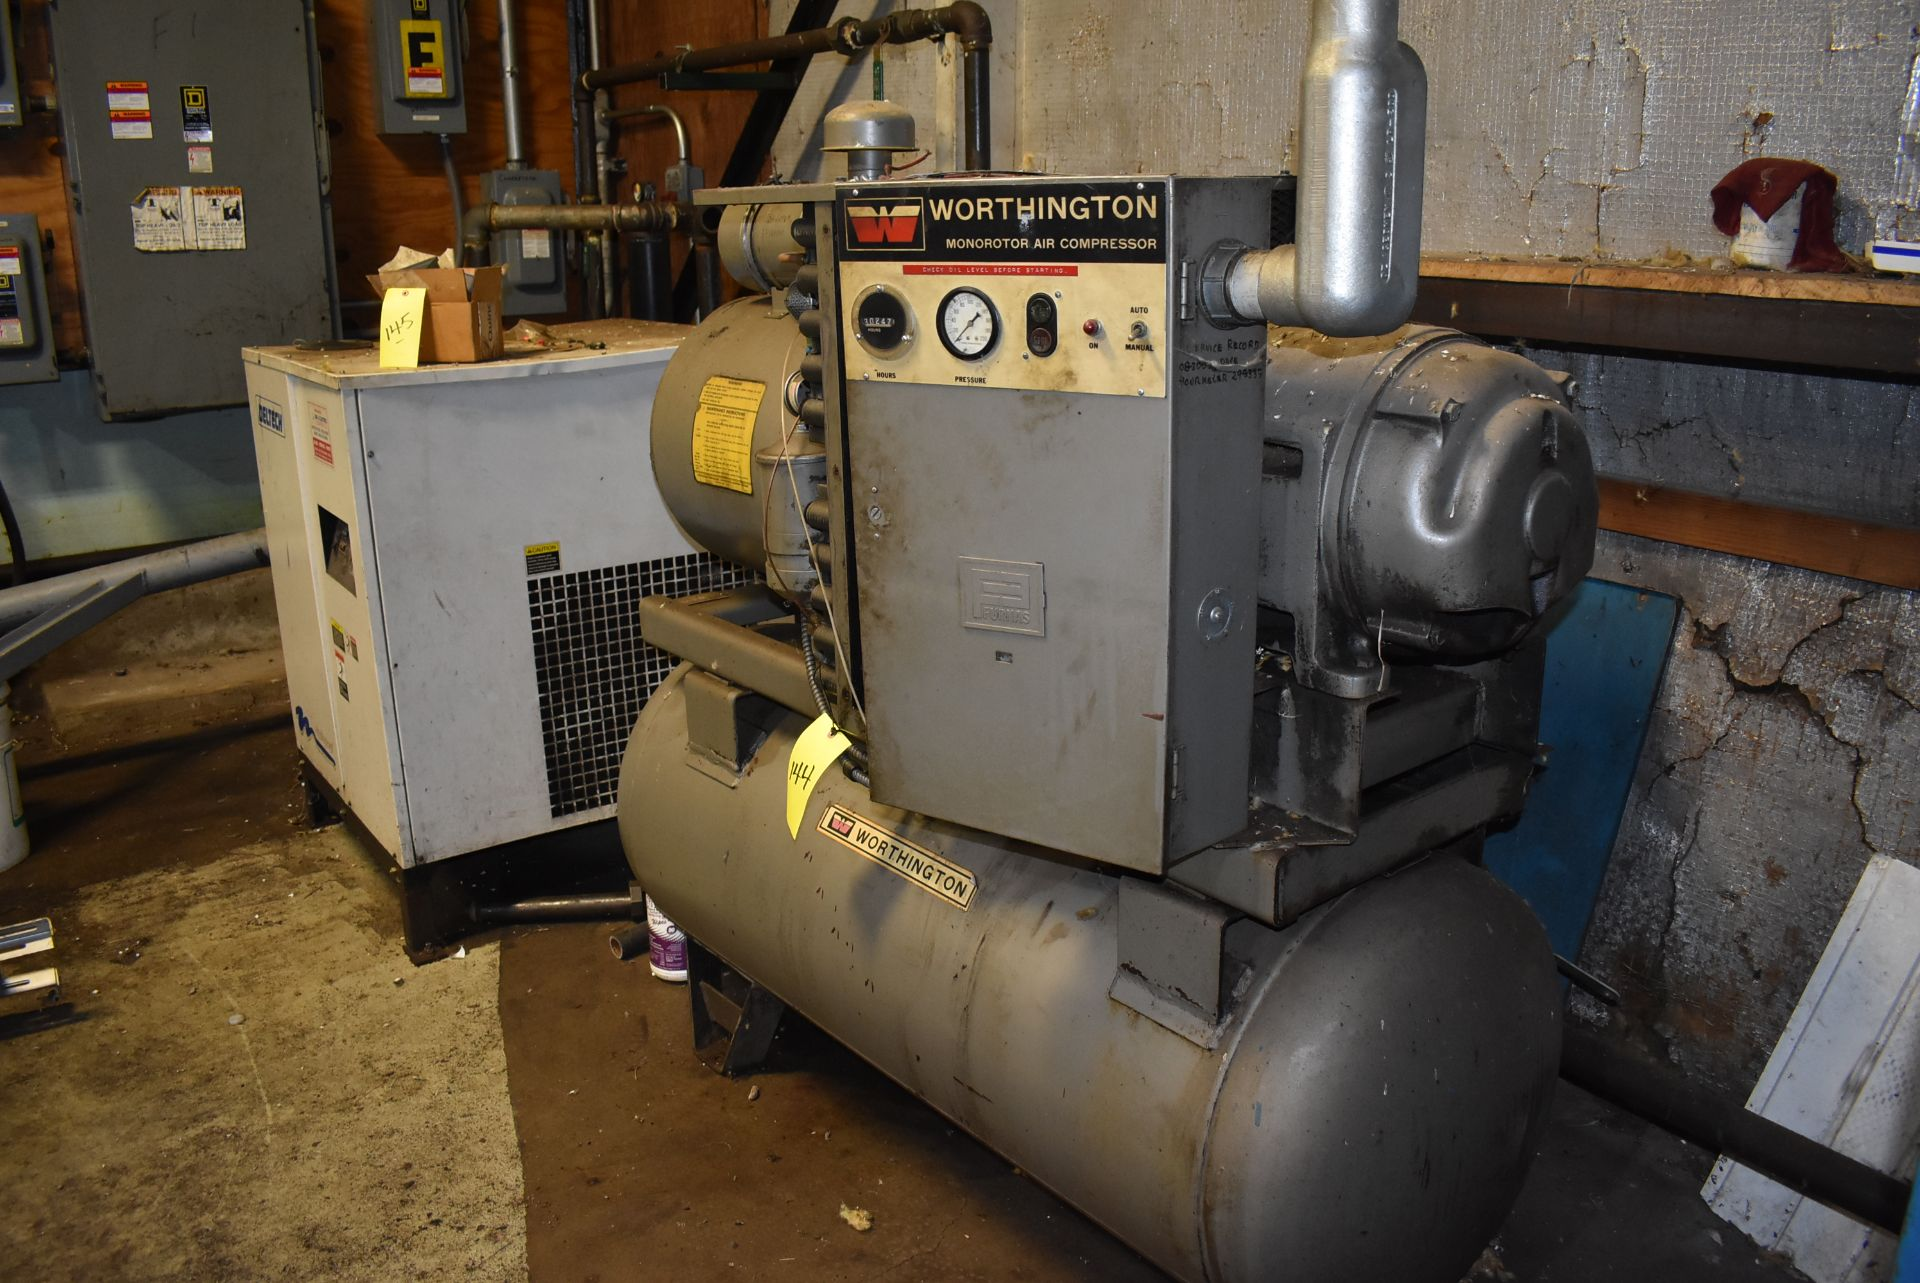 Worthington 30 HP Monoroto Air Compressor - Image 2 of 2